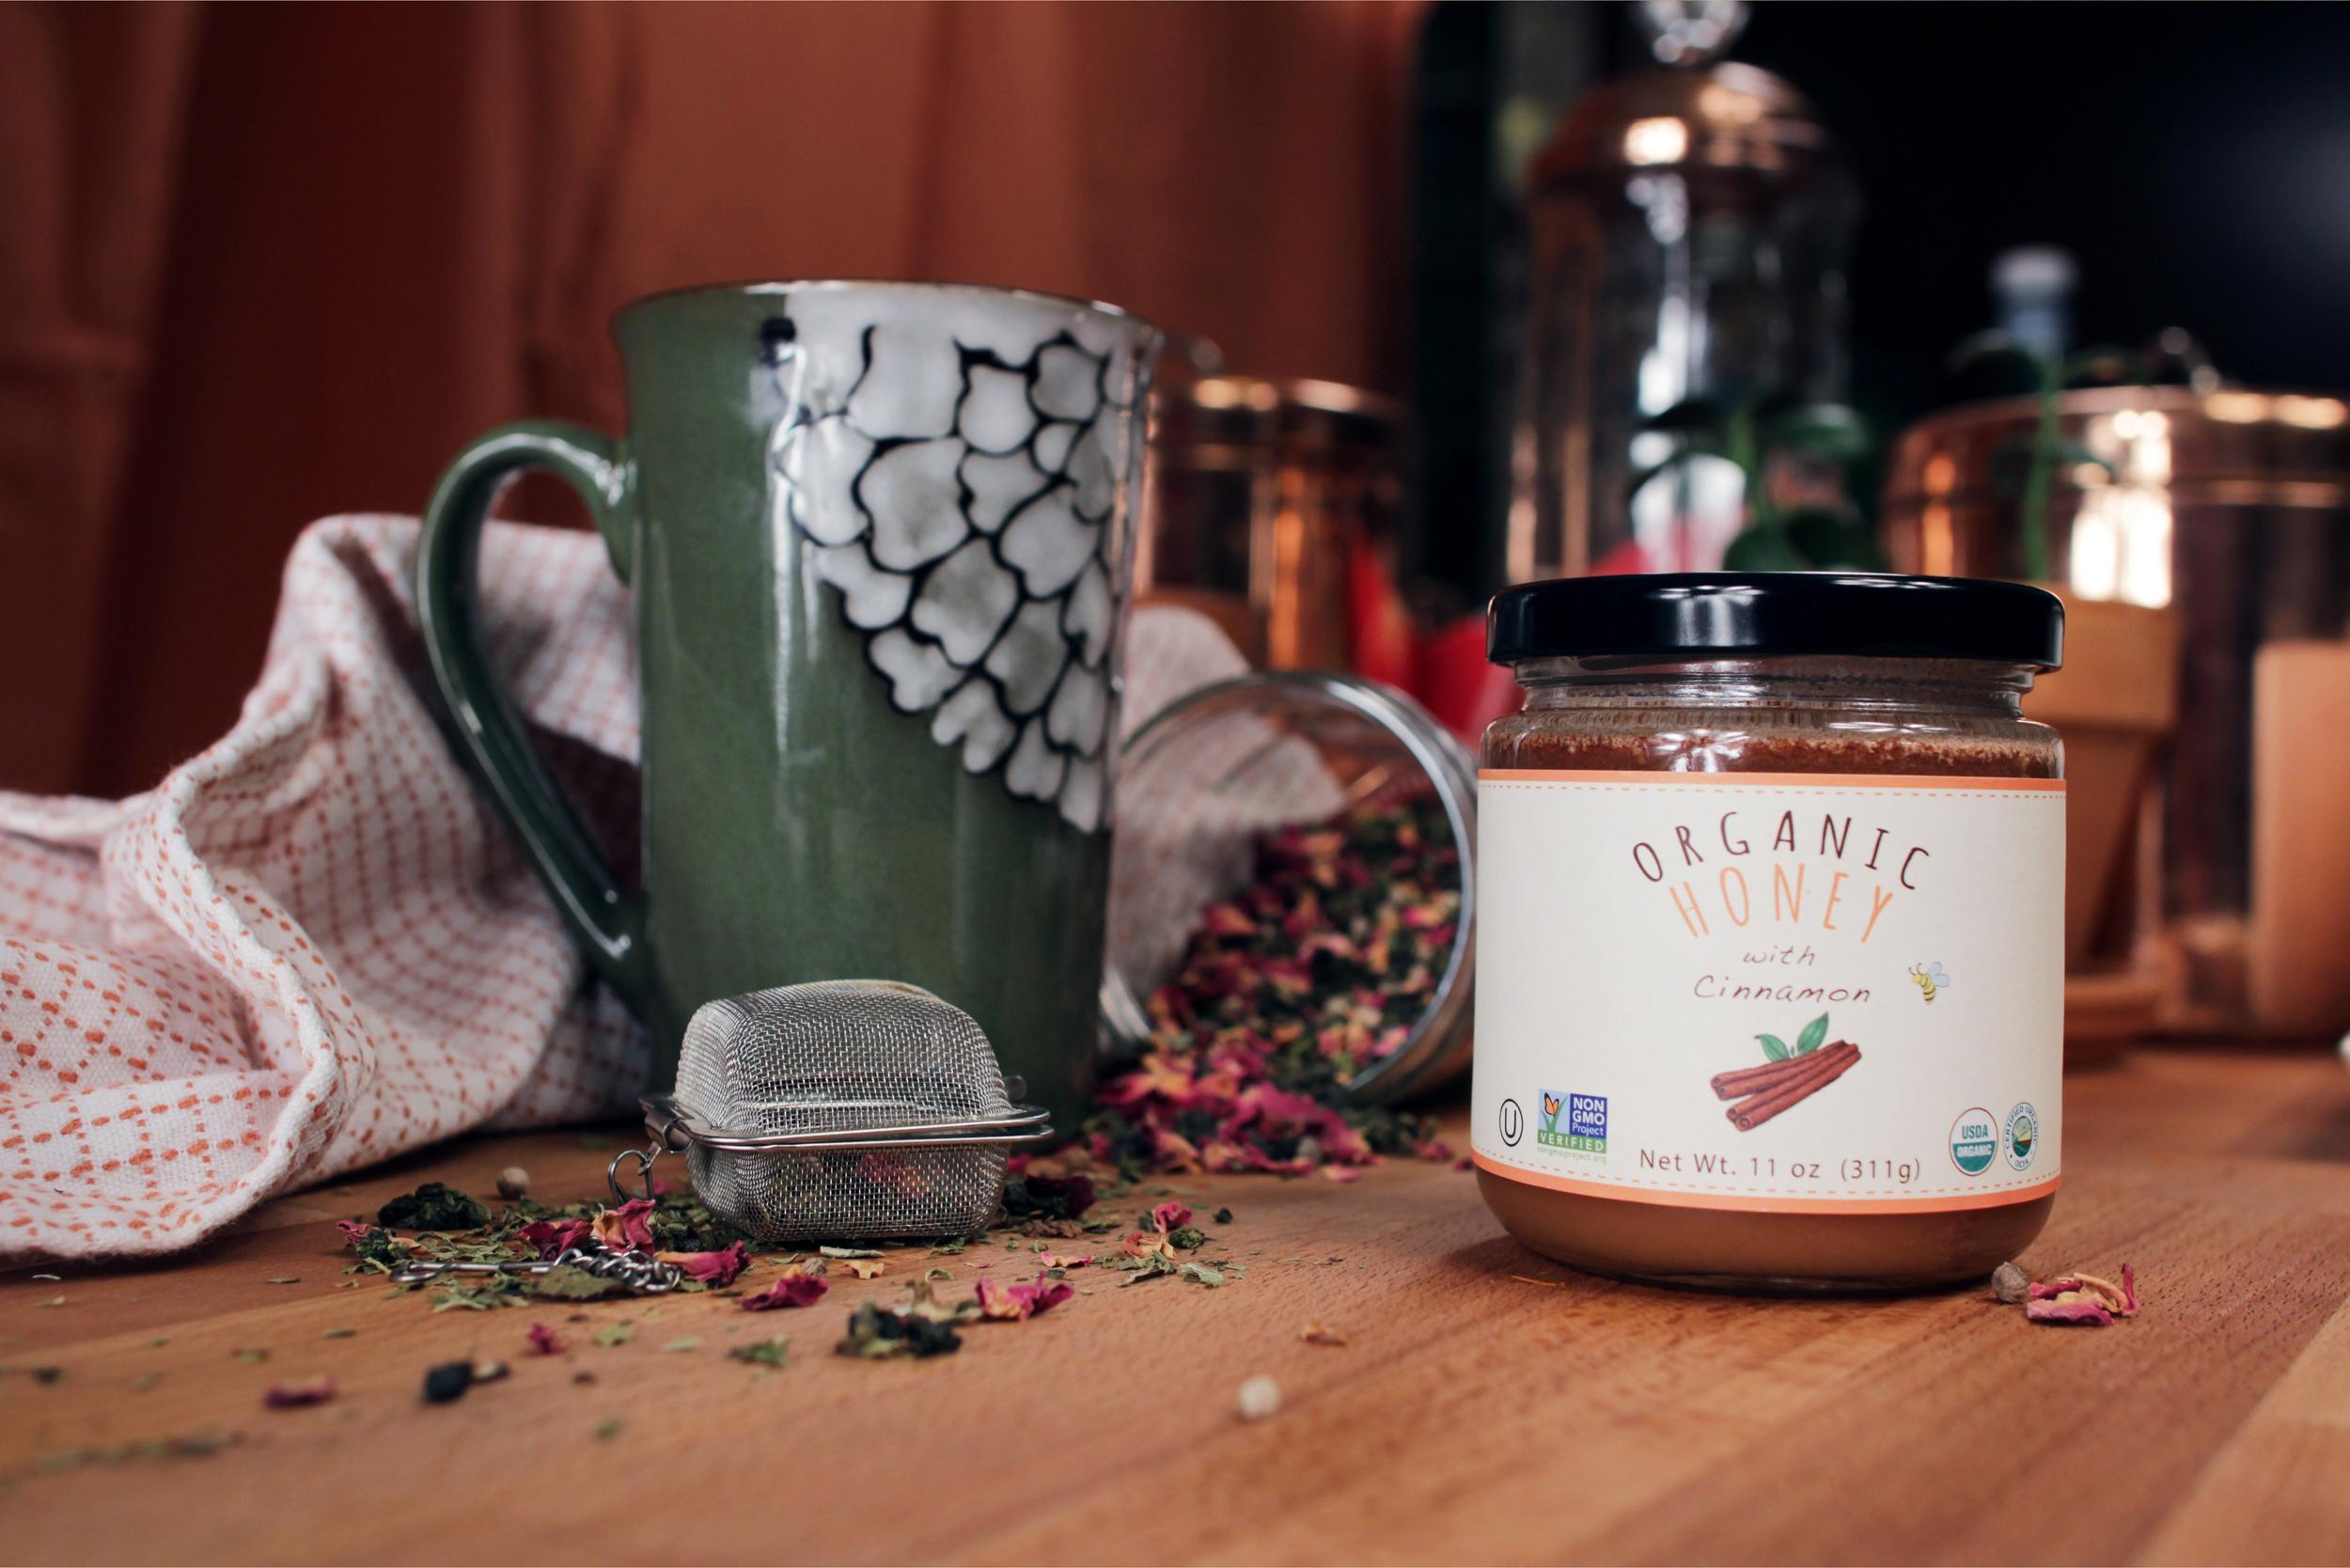 Honey Cinnamon w Green Cup e.jpg